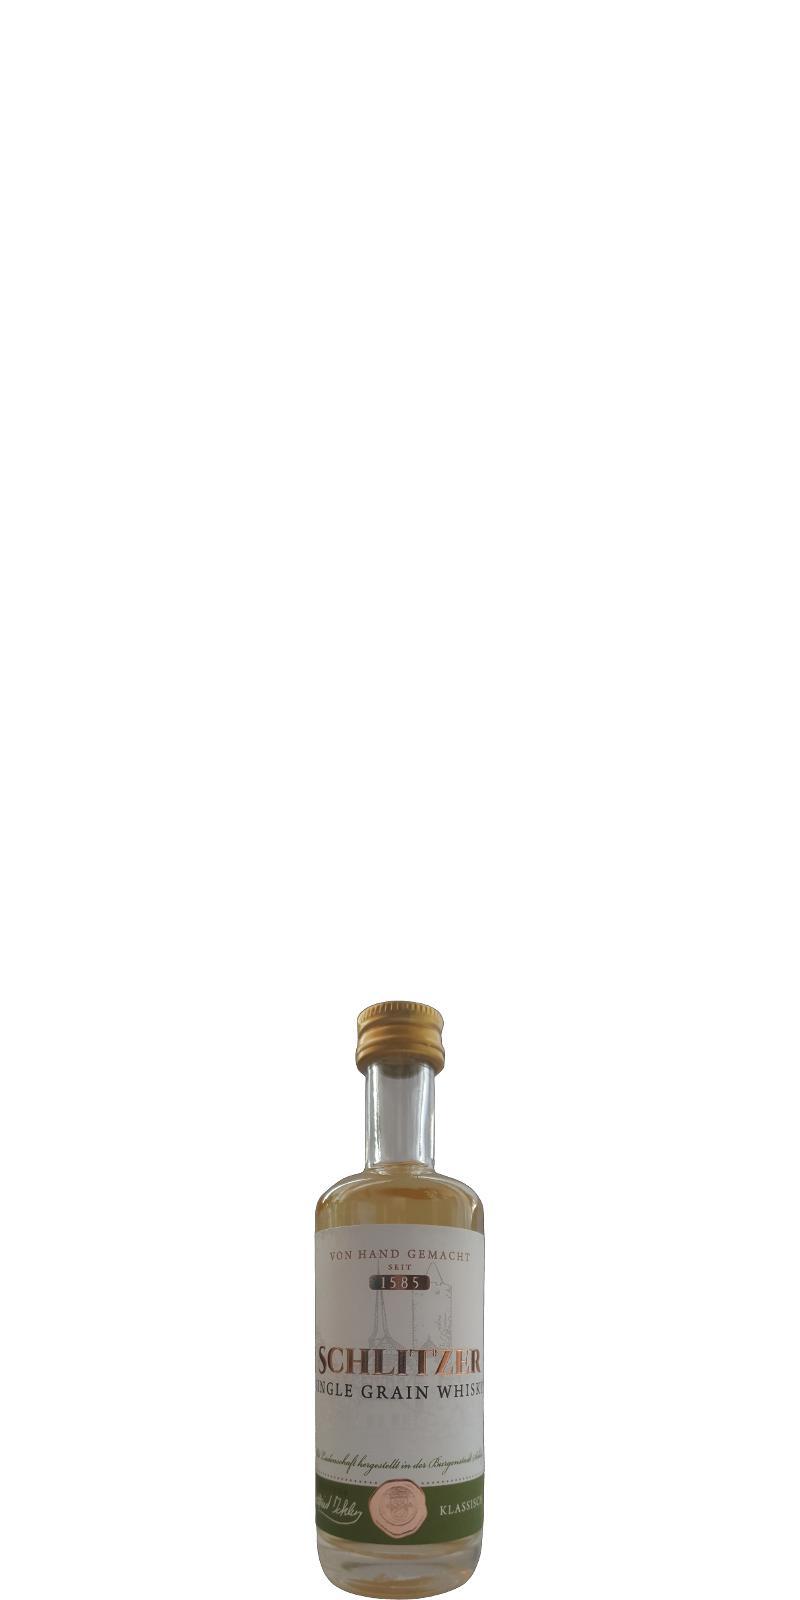 Schlitzer Single Grain Whisky